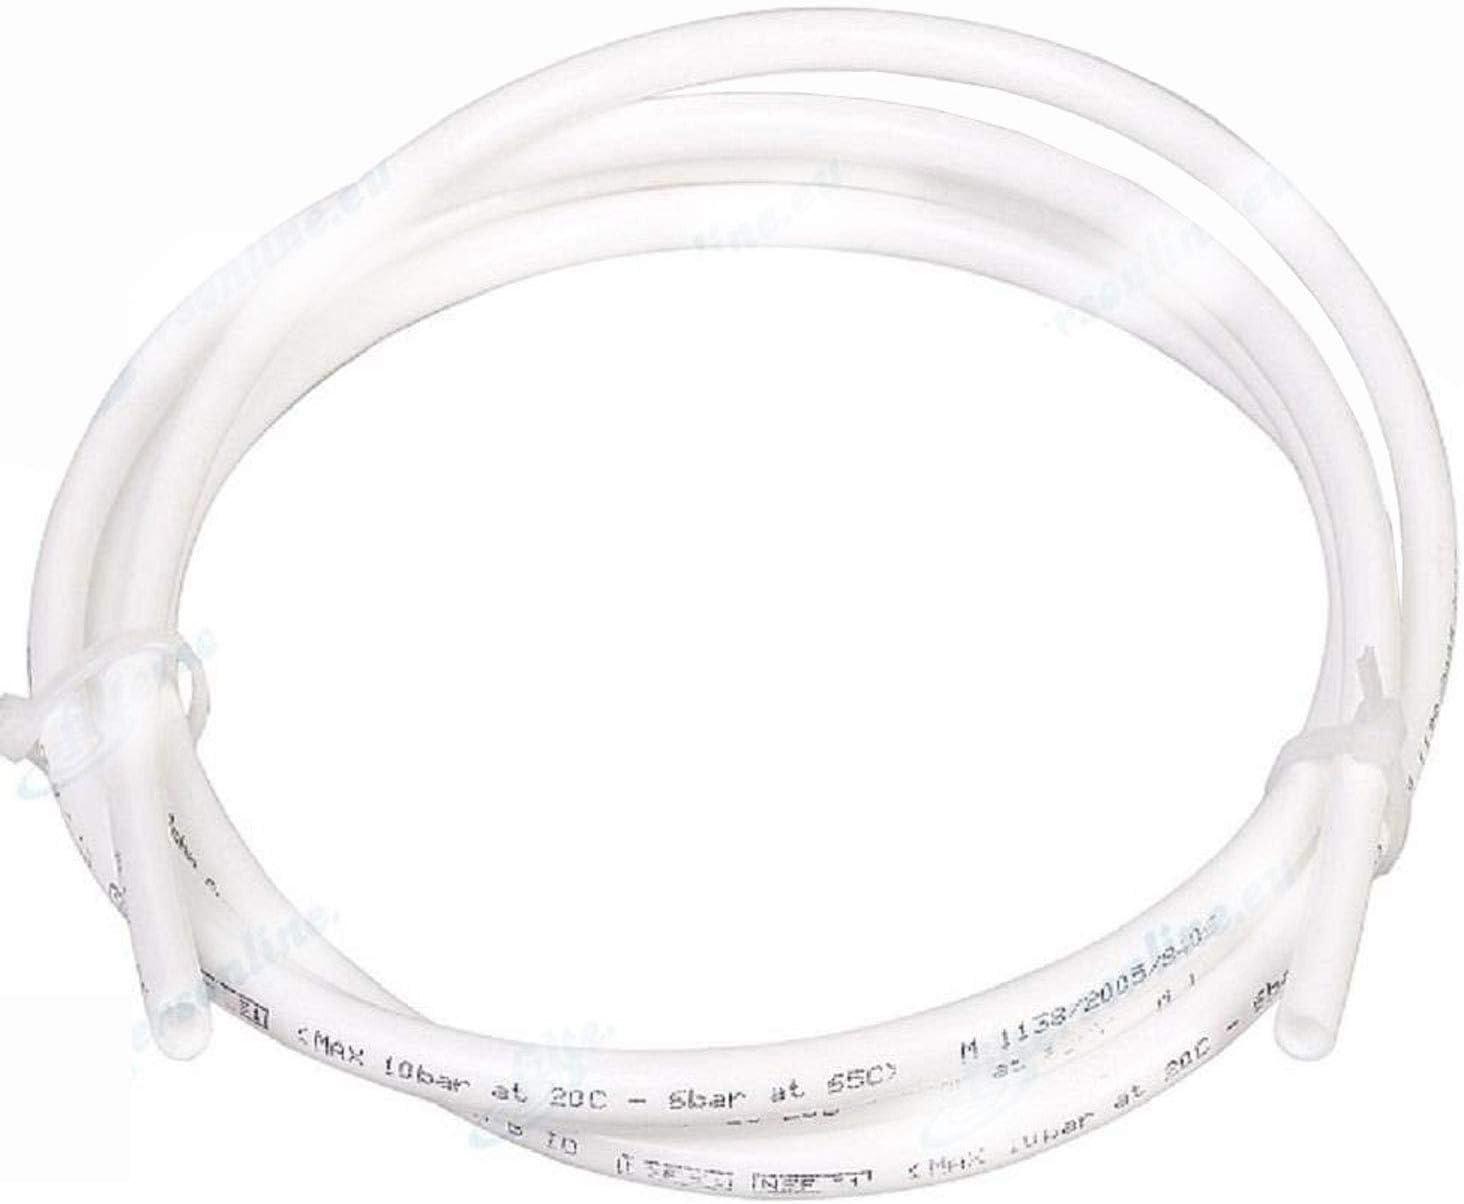 Aqualogis Tubo de agua blanco 1/4, (6.35mm) 10 m, para sistemas de ósmosis inversa, refrigeradores, máquinas de café espresso, máquinas expendedoras, y filtros de agua.